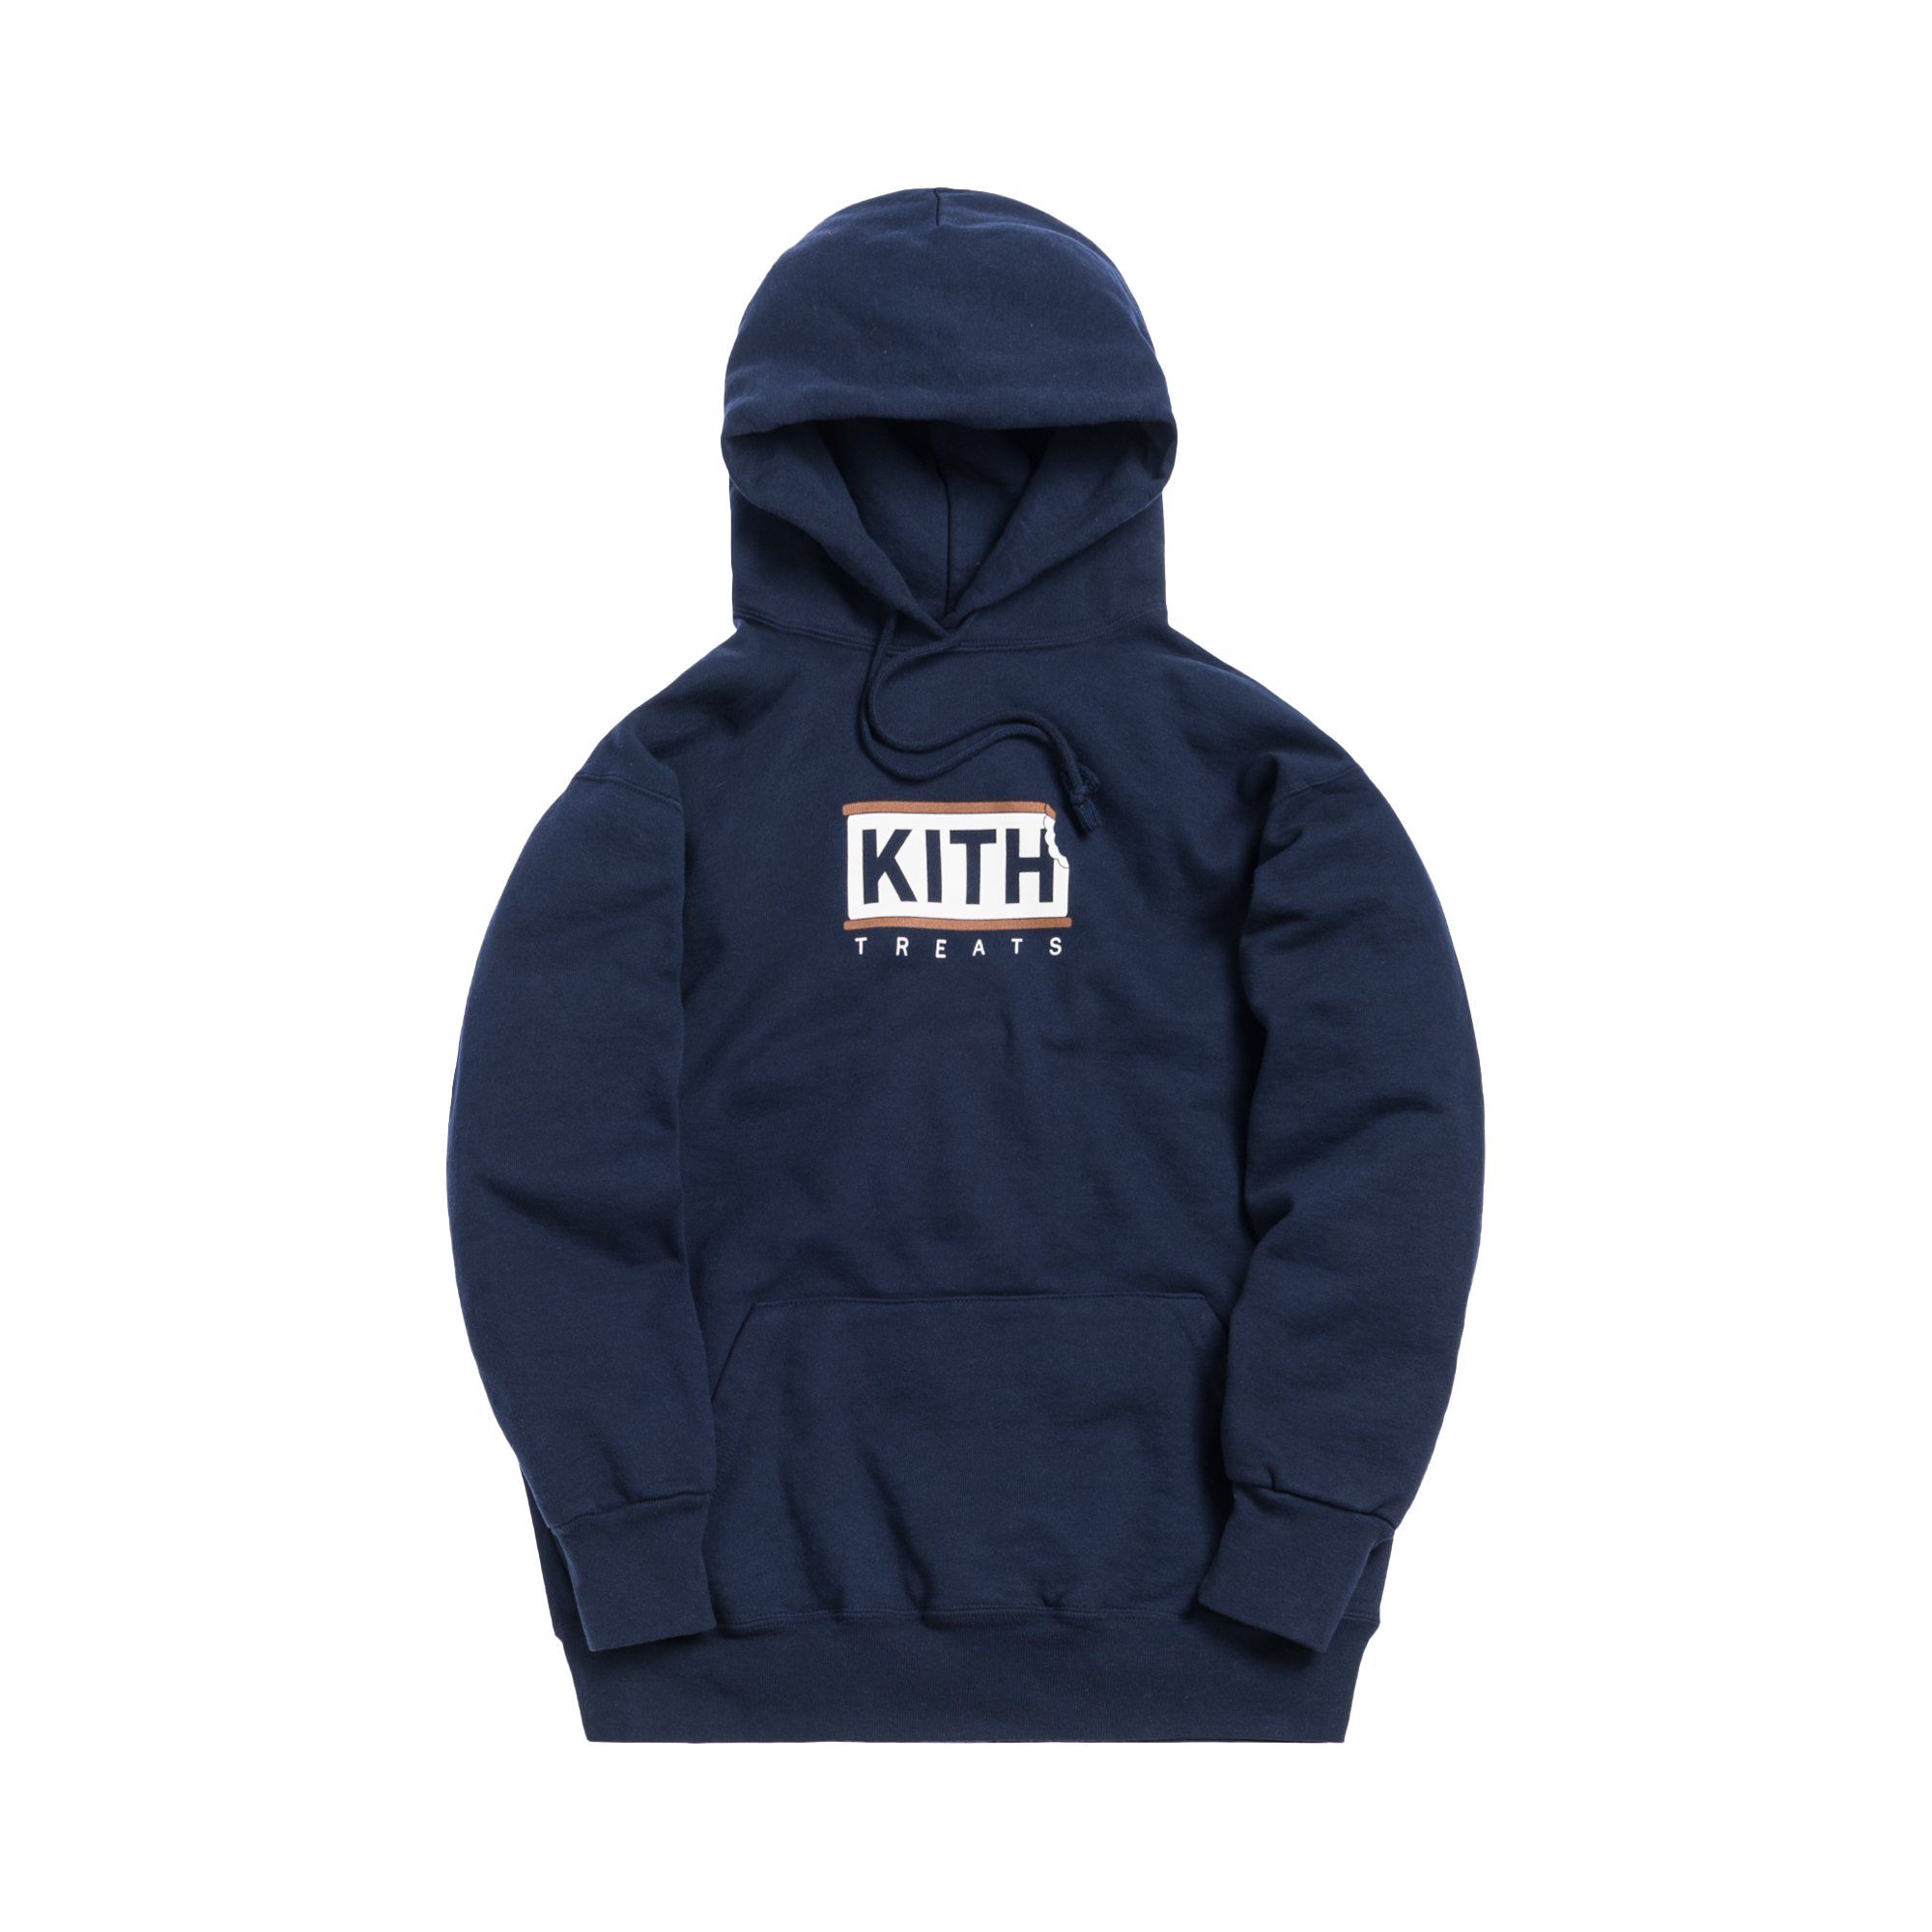 Kith Treats Ice Cream Sandwich Hoodie Navy